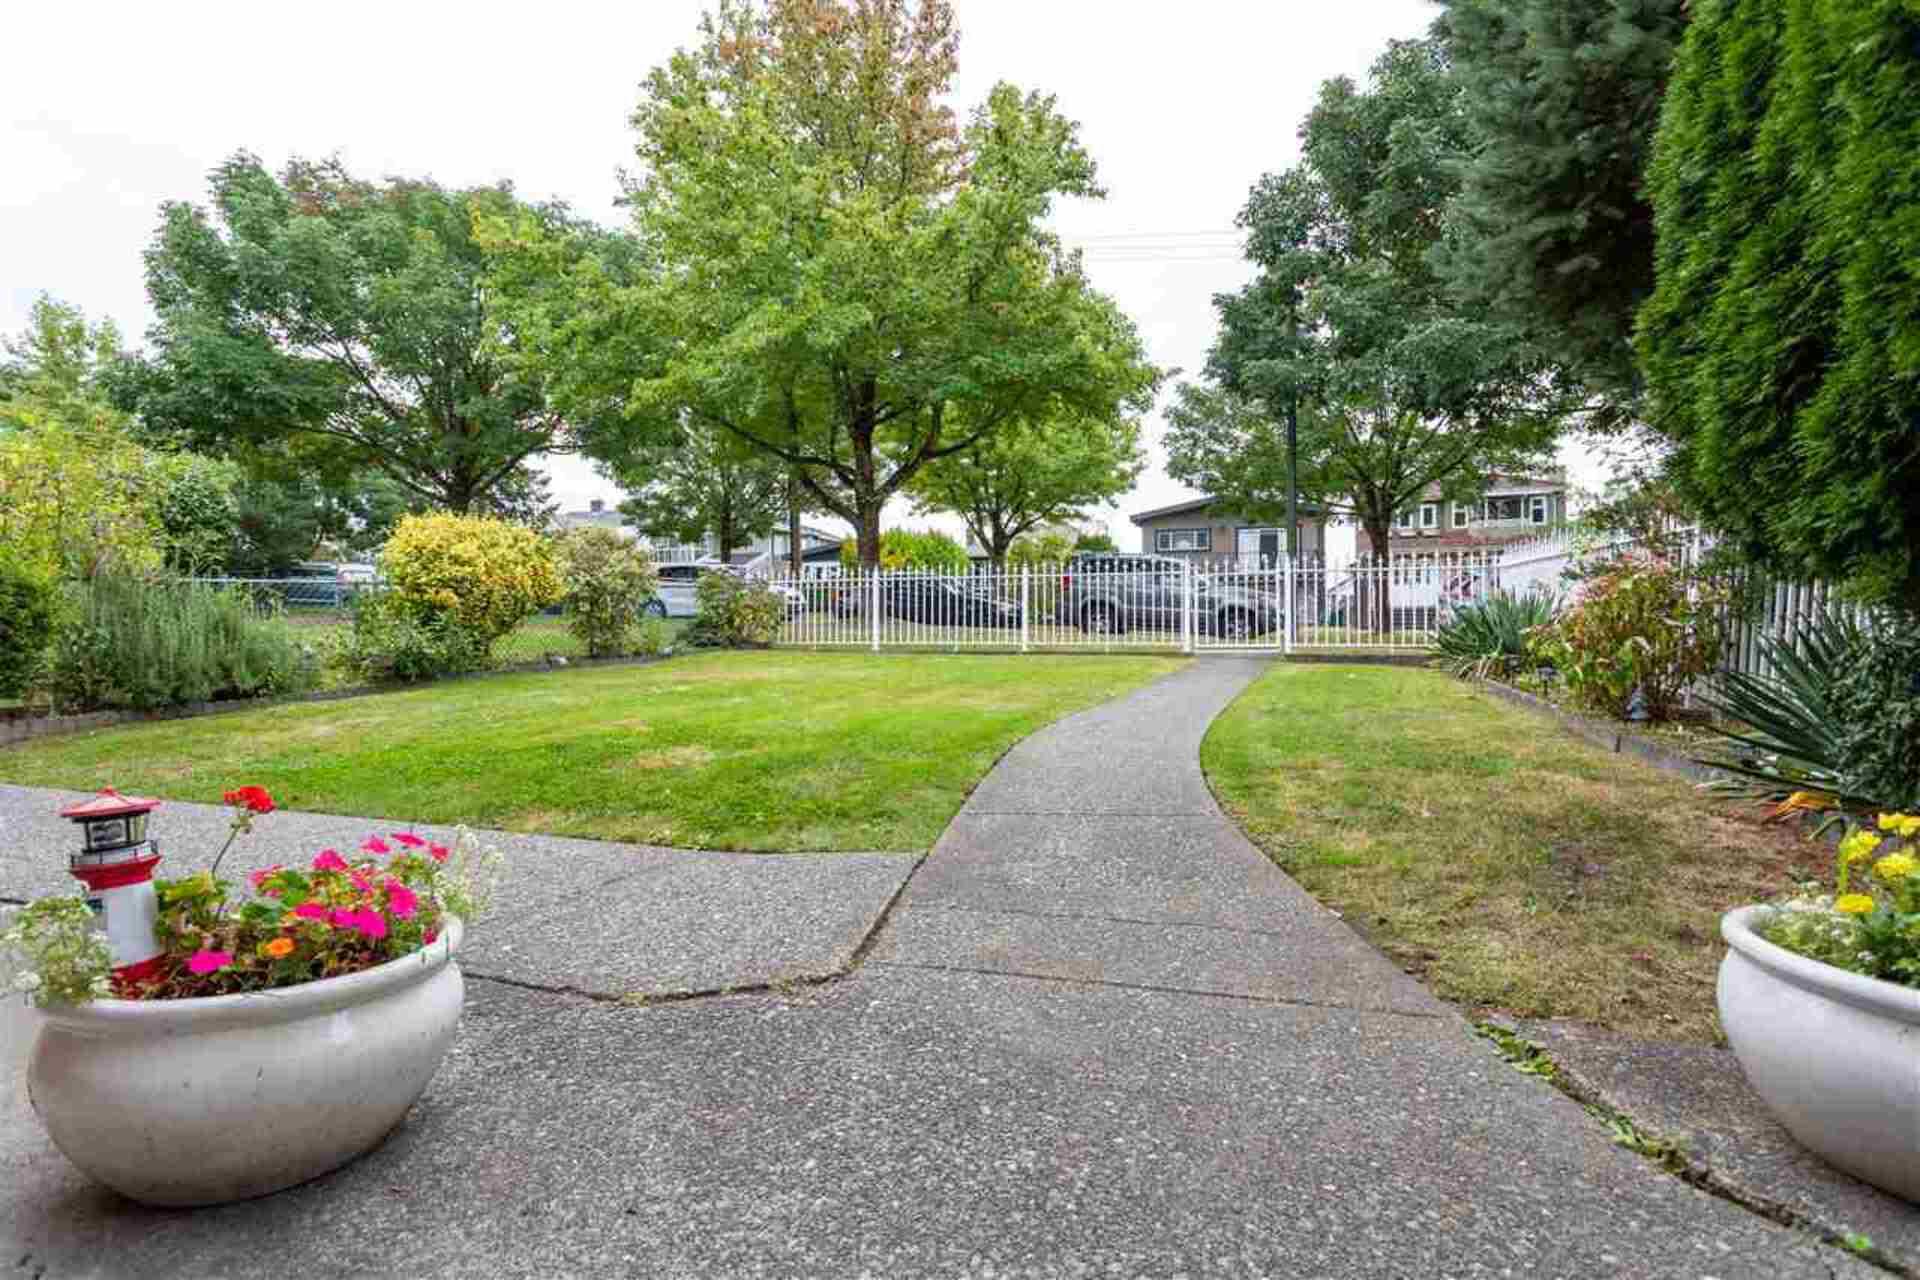 2675-e-5th-avenue-renfrew-ve-vancouver-east-03 at 2675 E 5th Avenue, Renfrew VE, Vancouver East